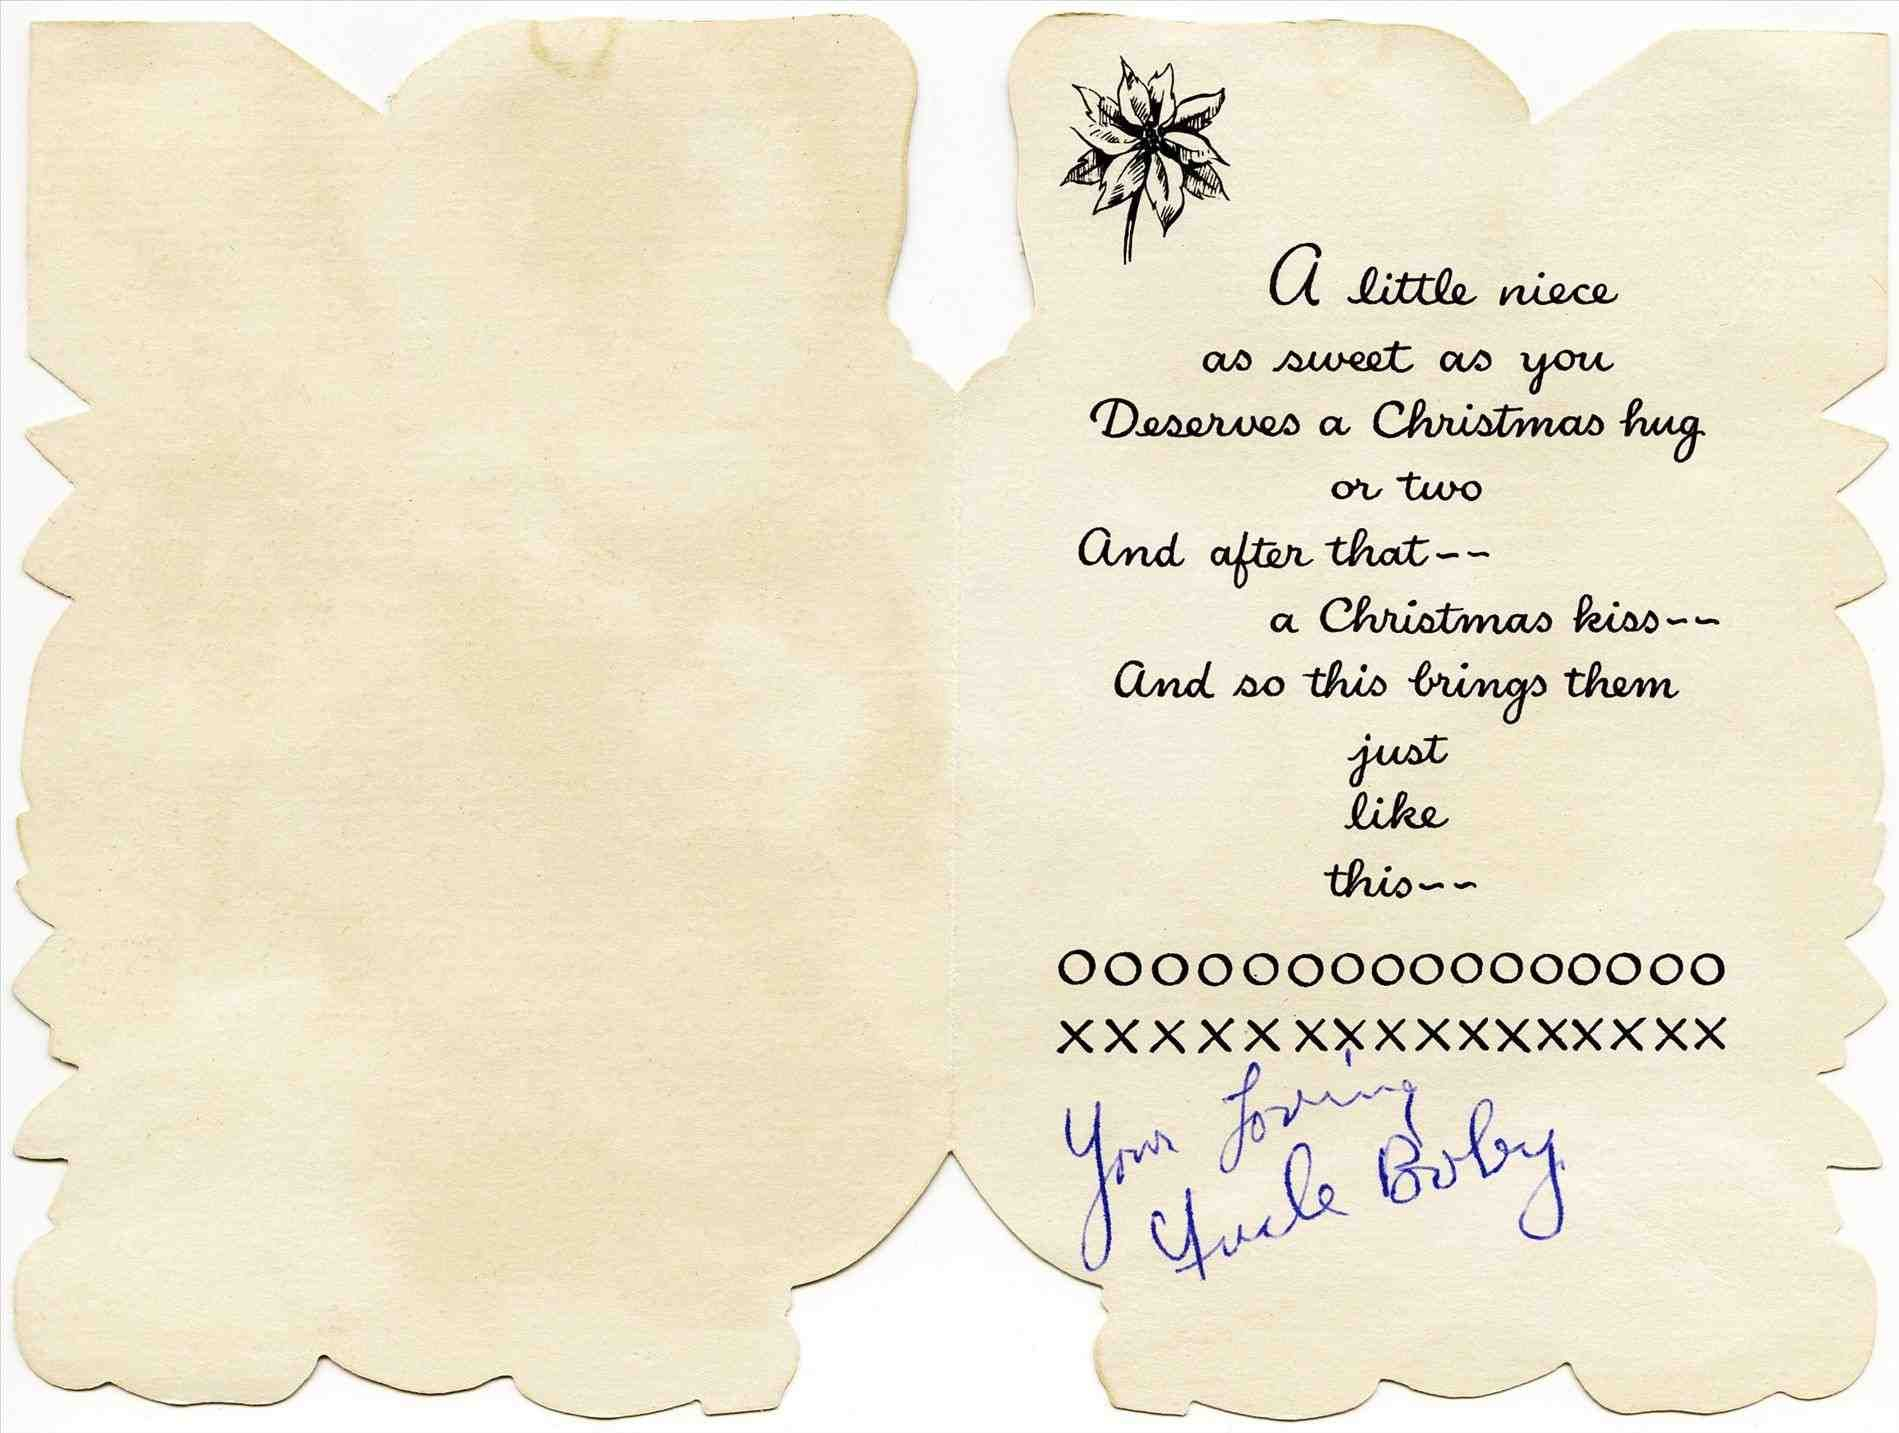 Card For Extraordinary Free Romantic Birthday Ecards With Music And Free Romantic Birthday Z Persona Free Birthday Card Retro Christmas Retro Christmas Cards